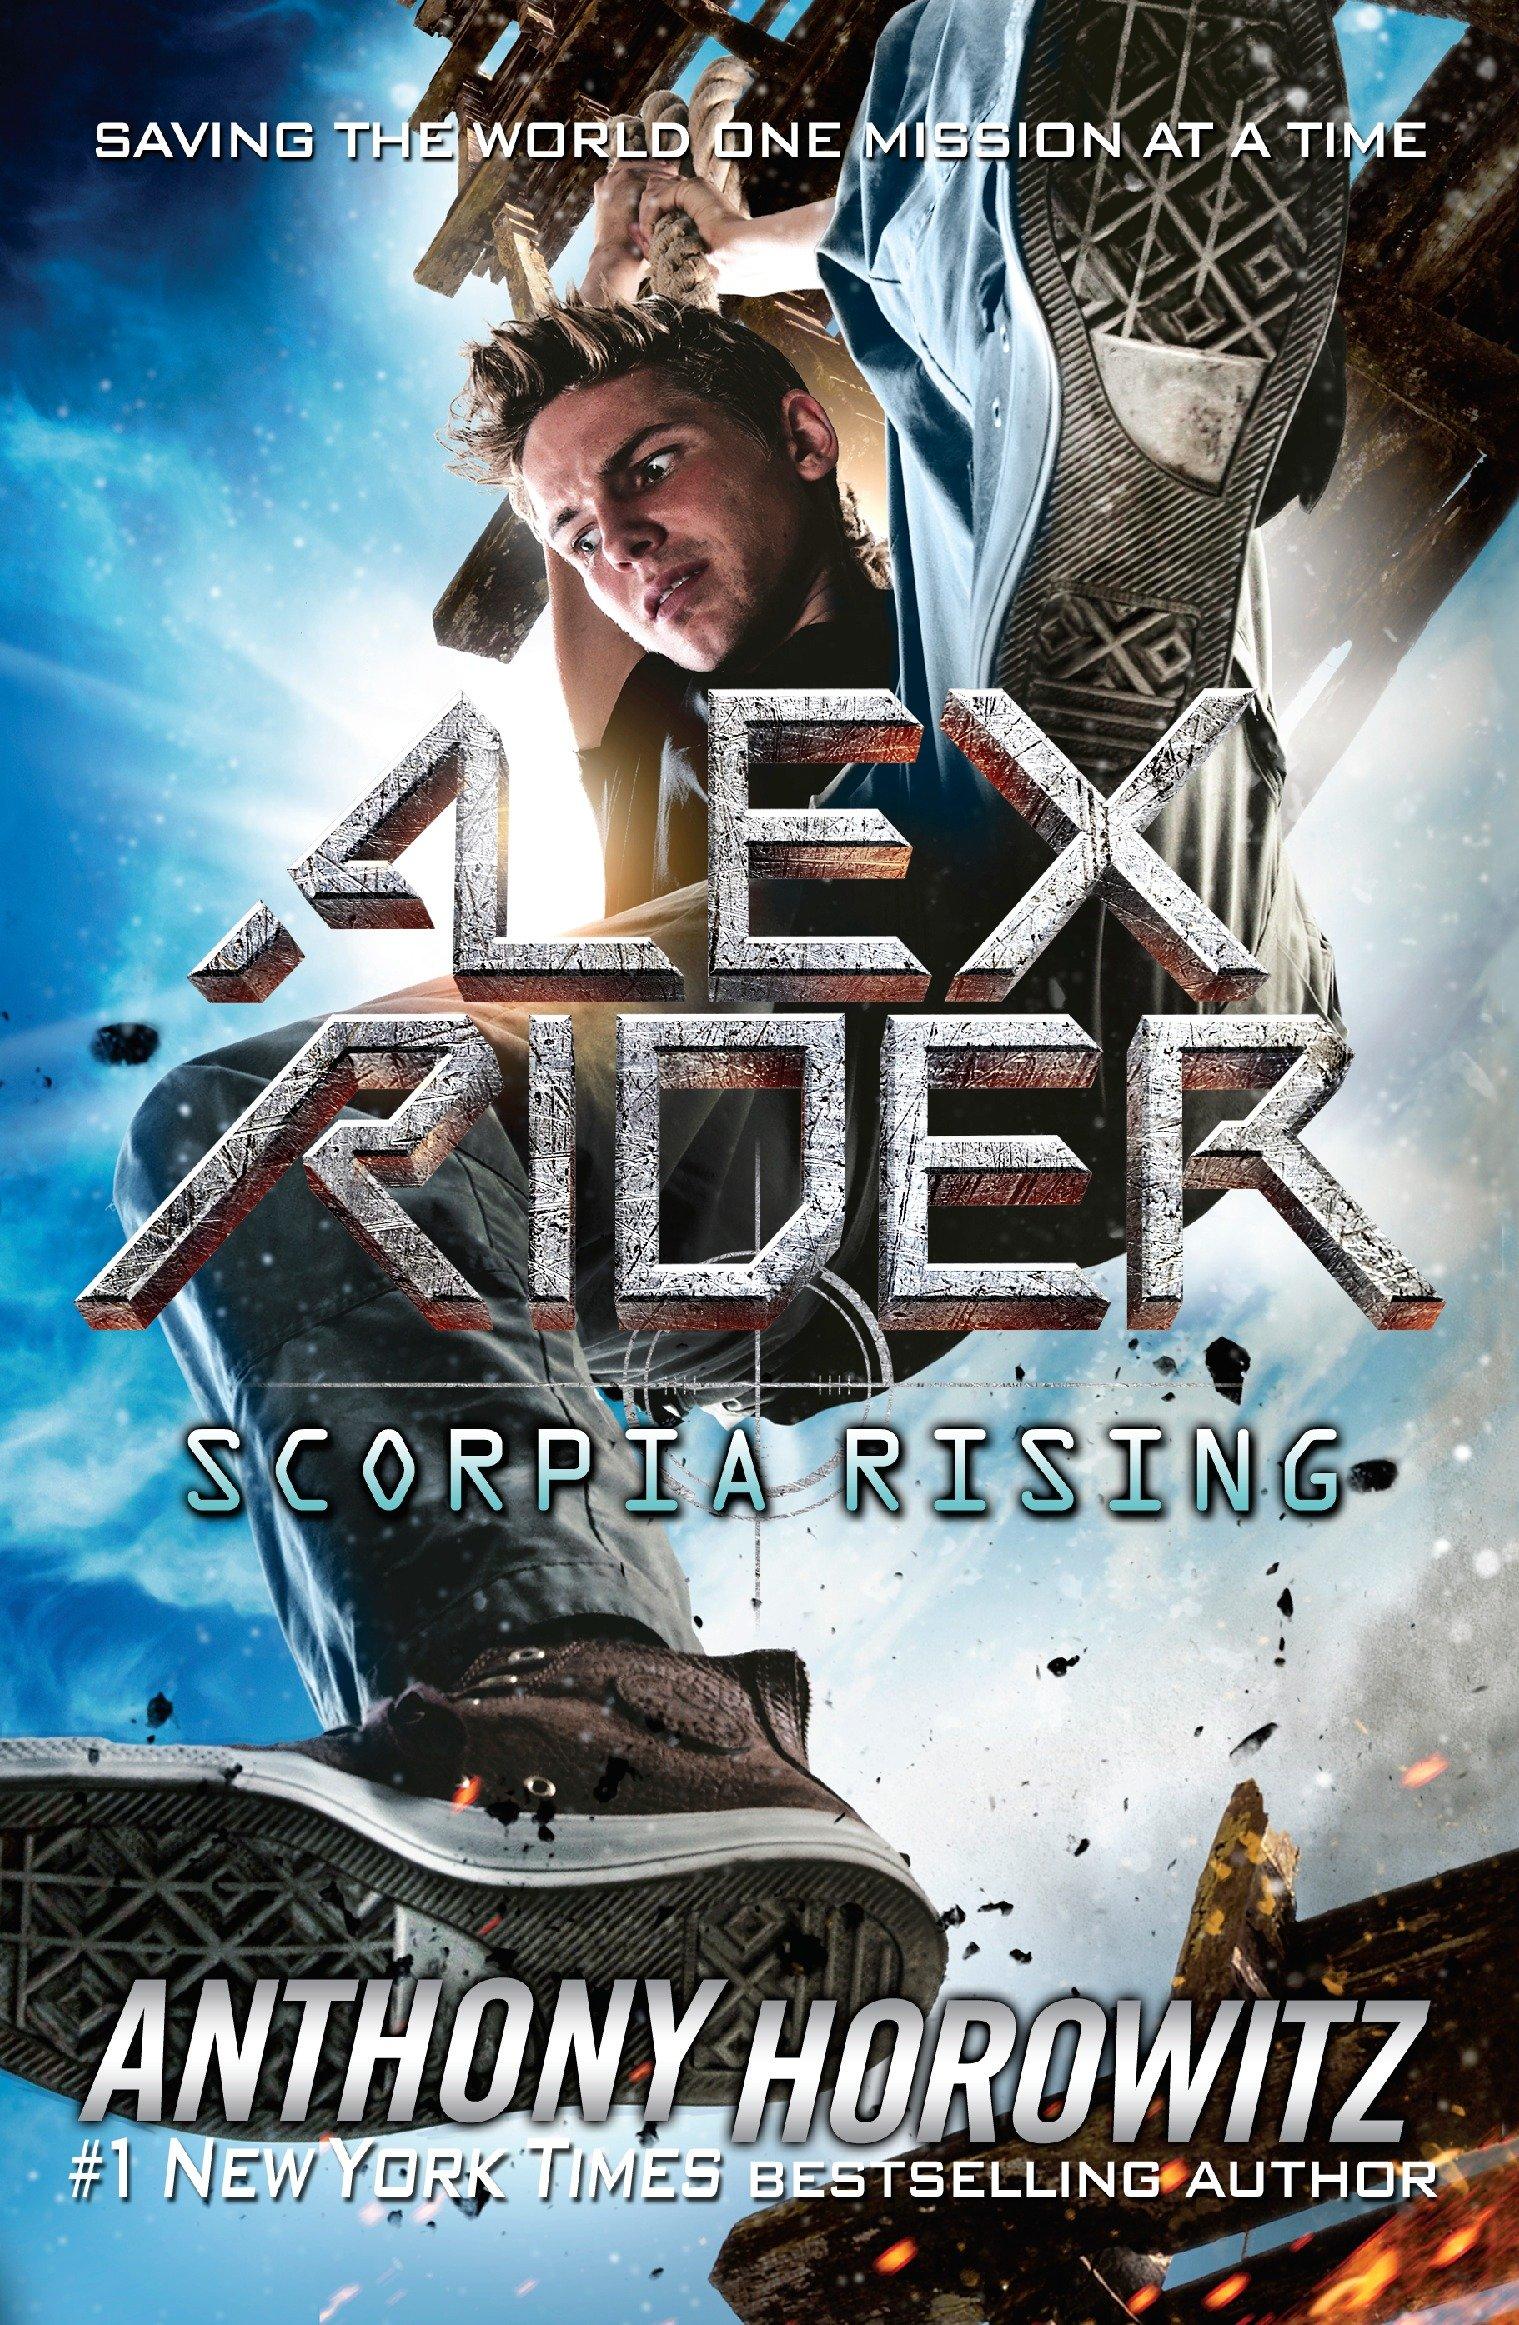 Scorpia rising cover image